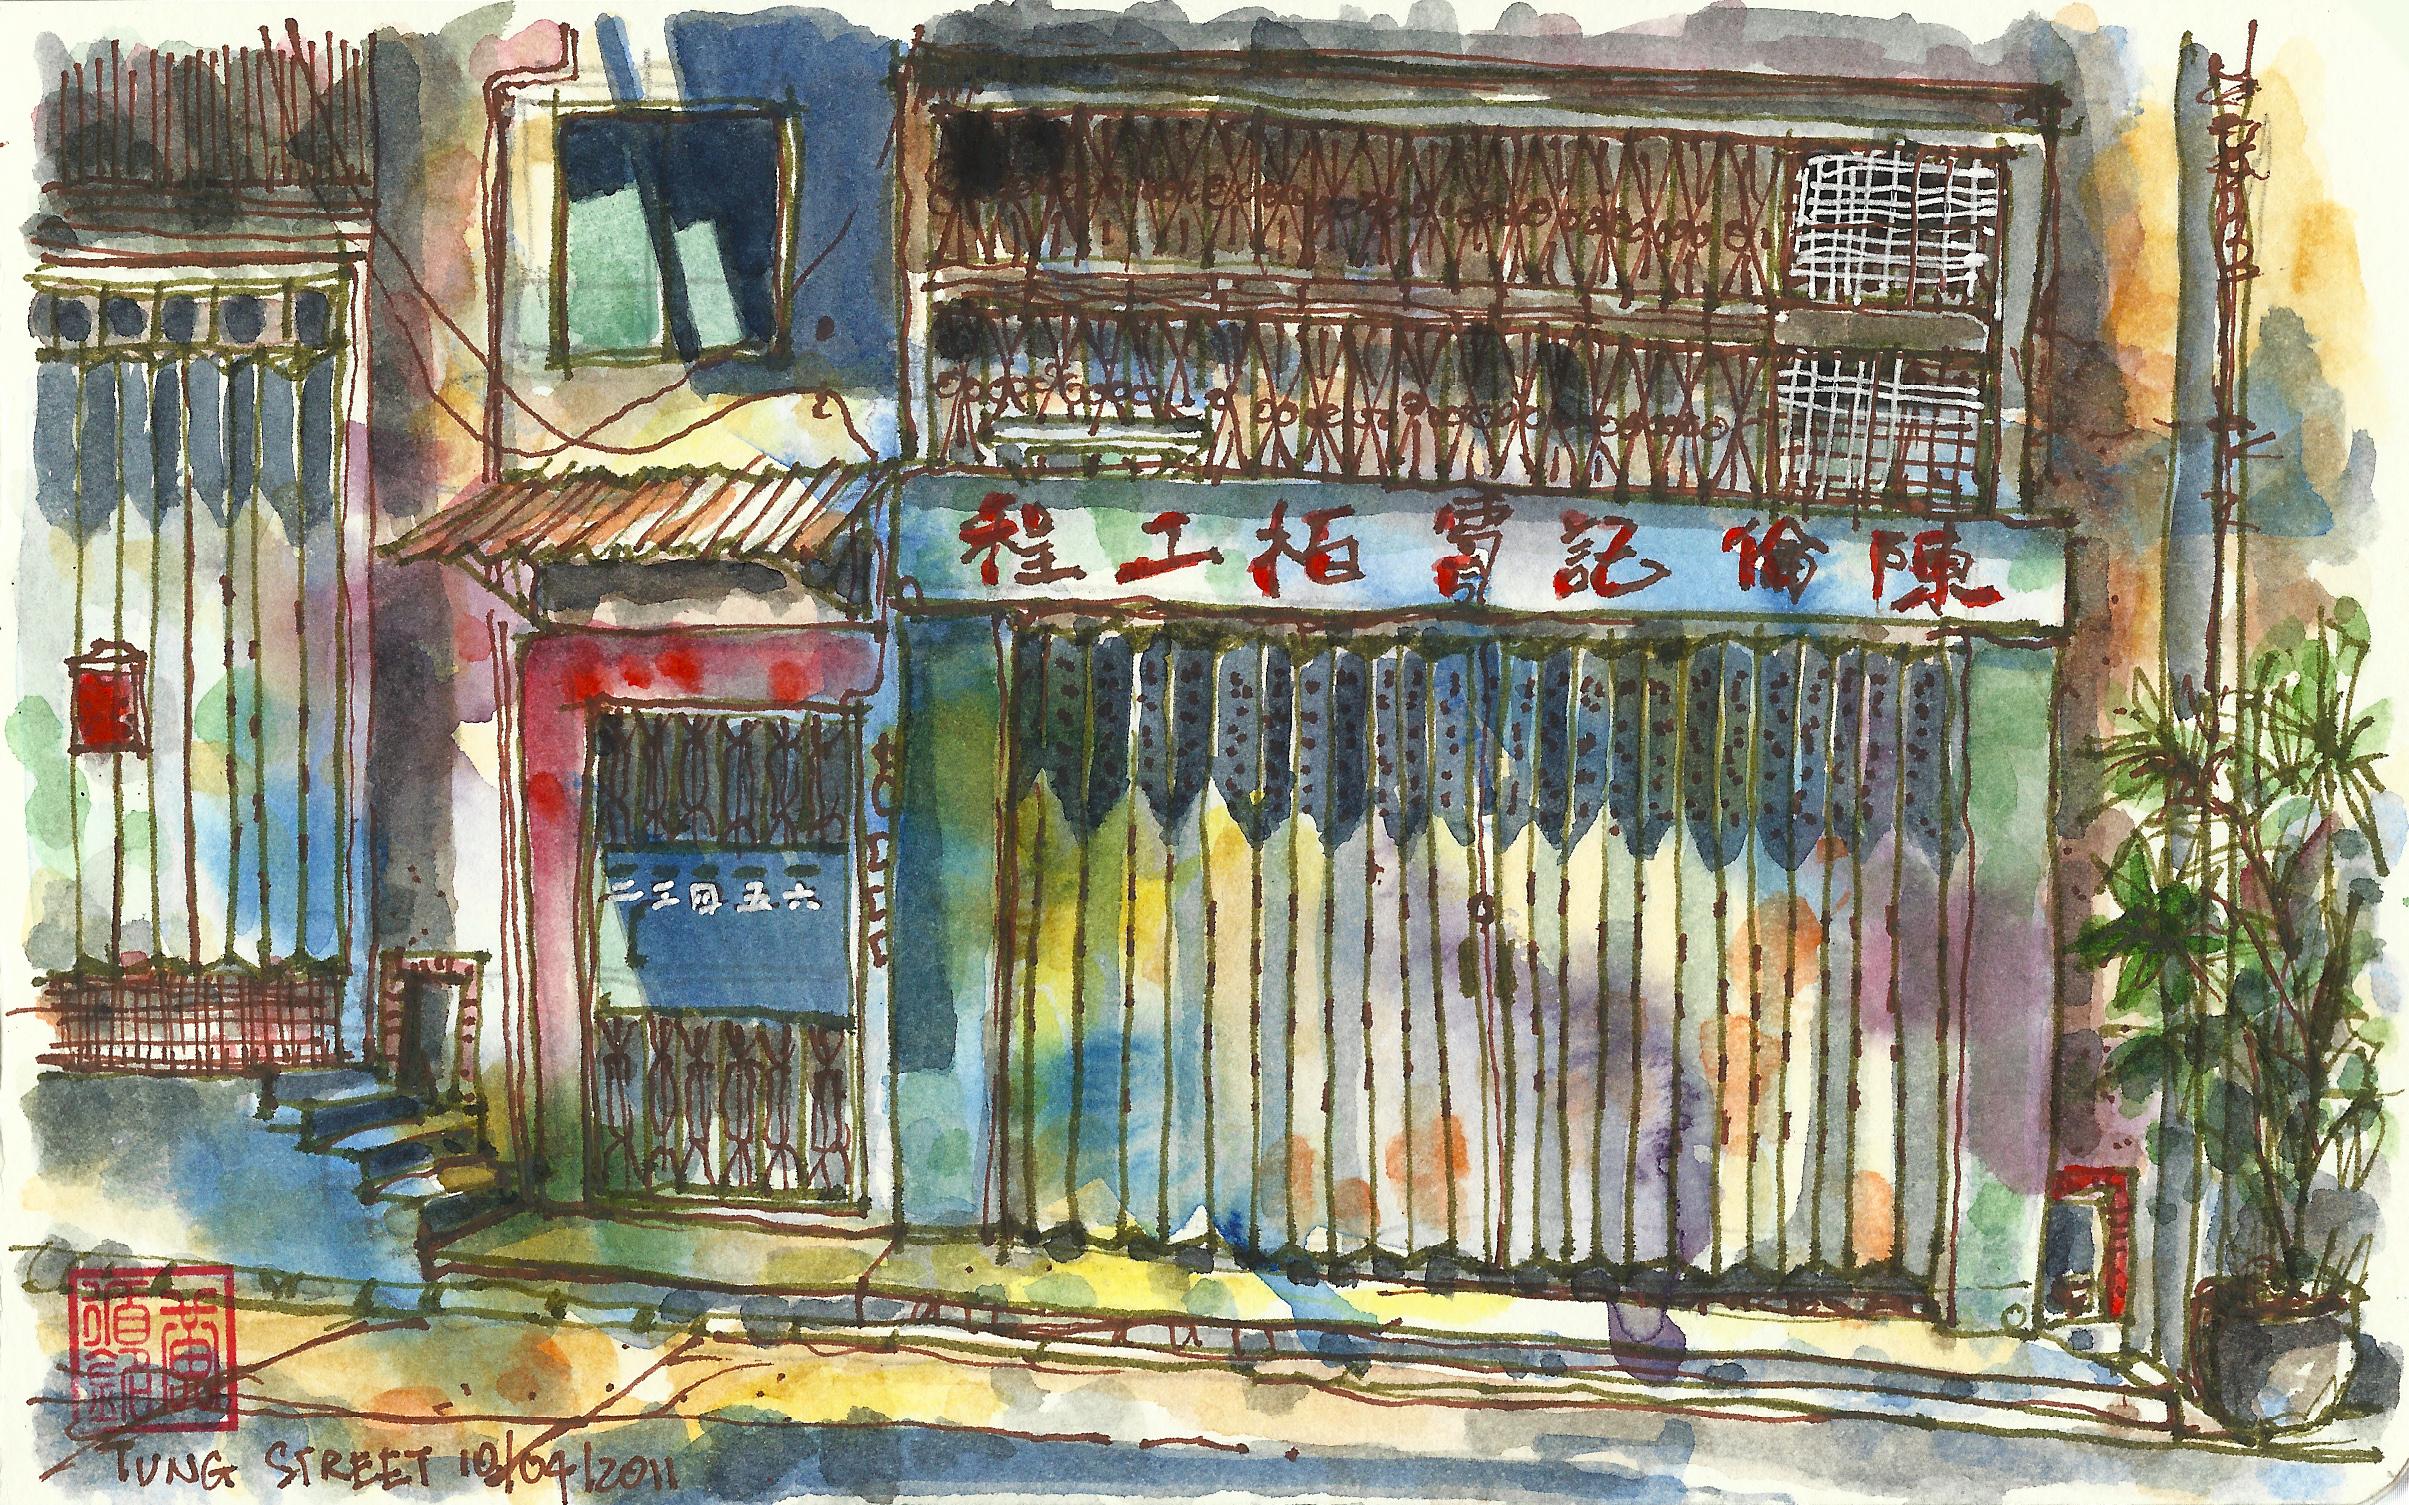 Tung Street